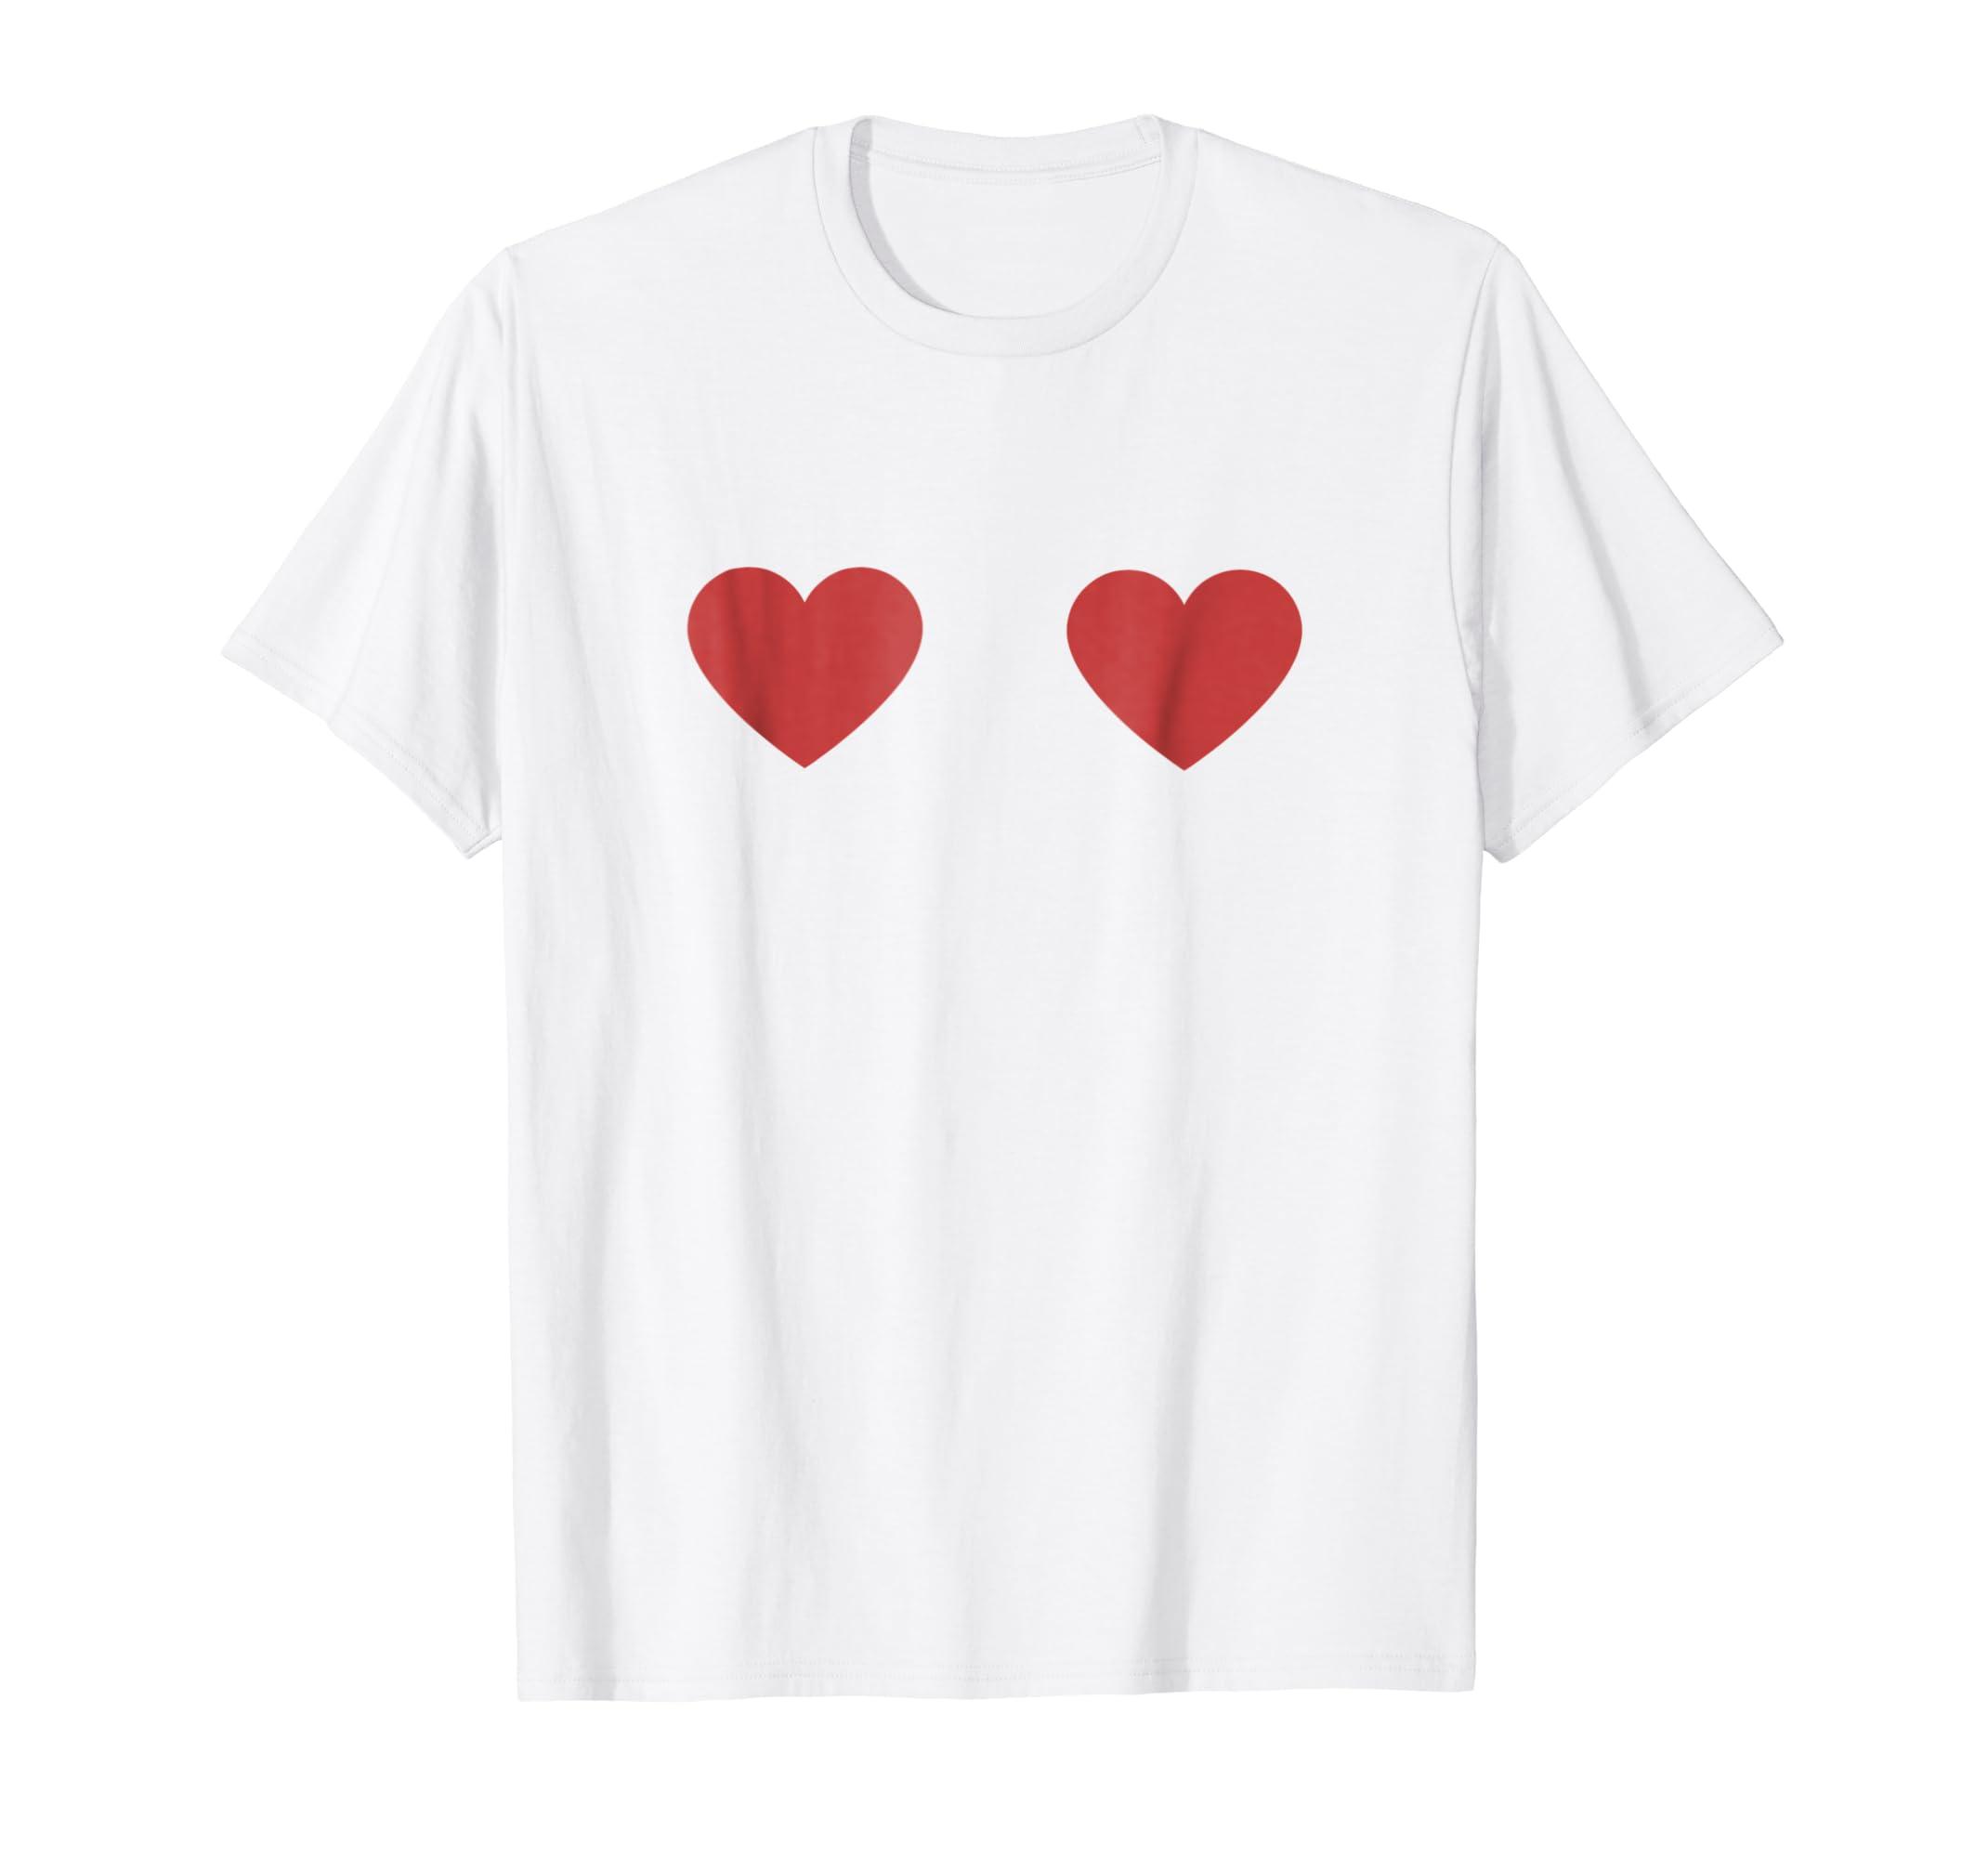 70a49f96 Amazon.com: Two Hearts TShirt Funny Valentine's Day Boob Shirt Heart 2:  Clothing